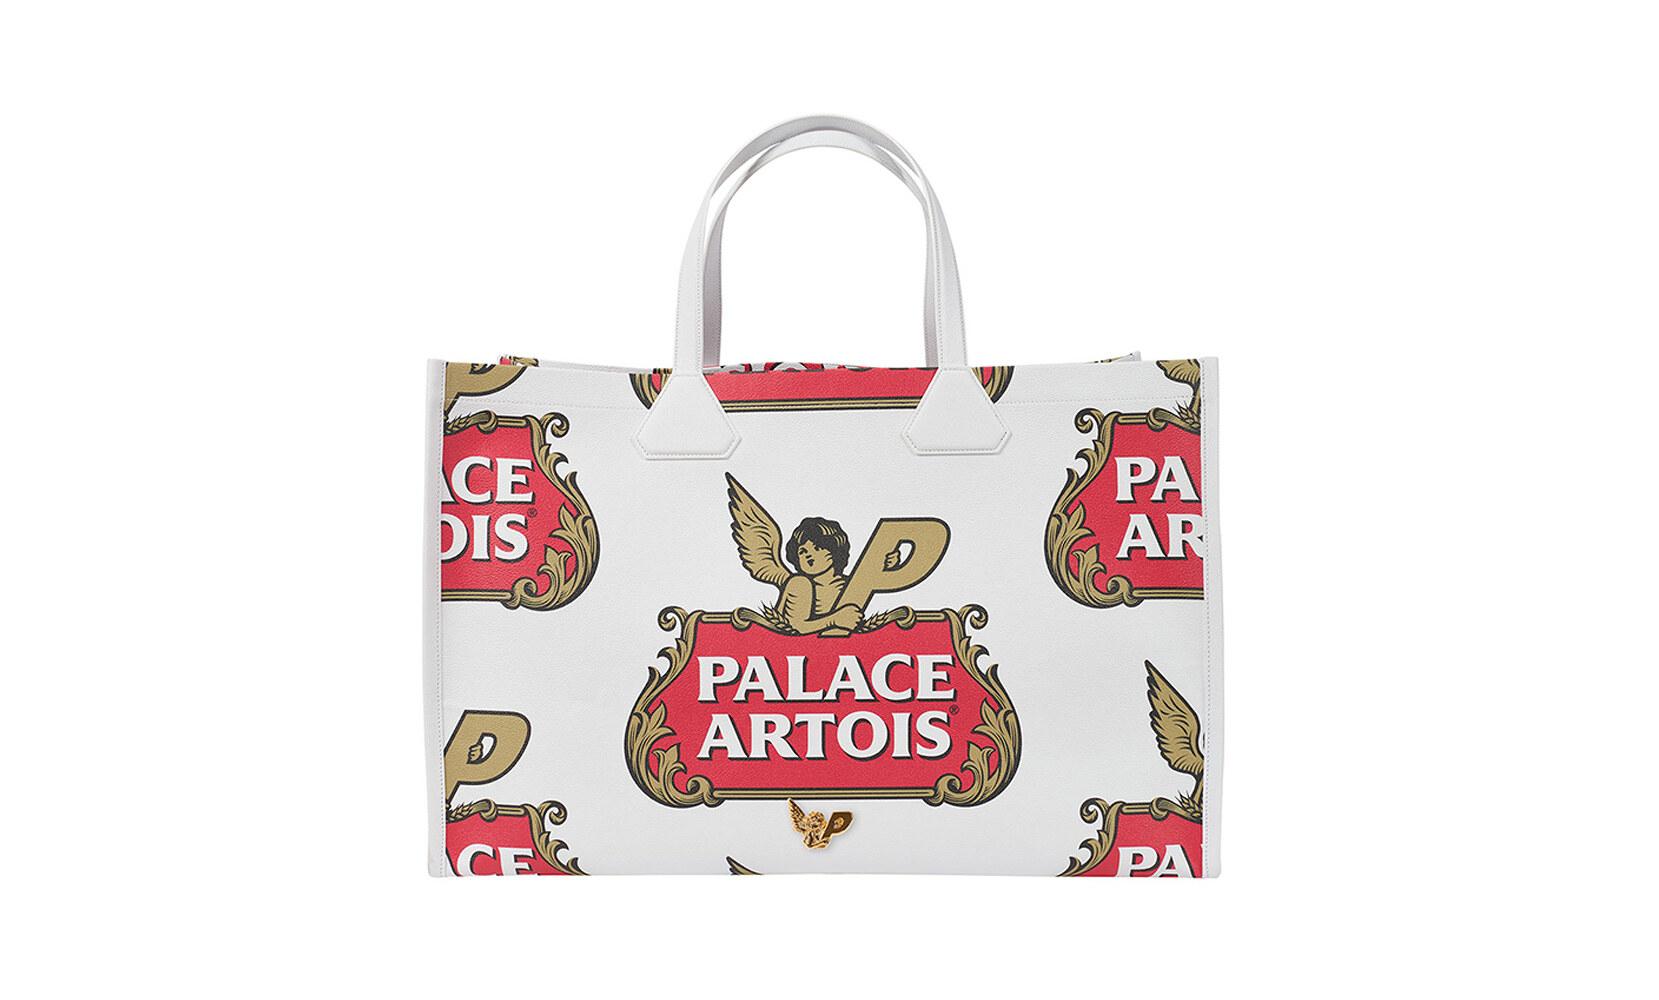 Palace Skateboard x Stella Artois